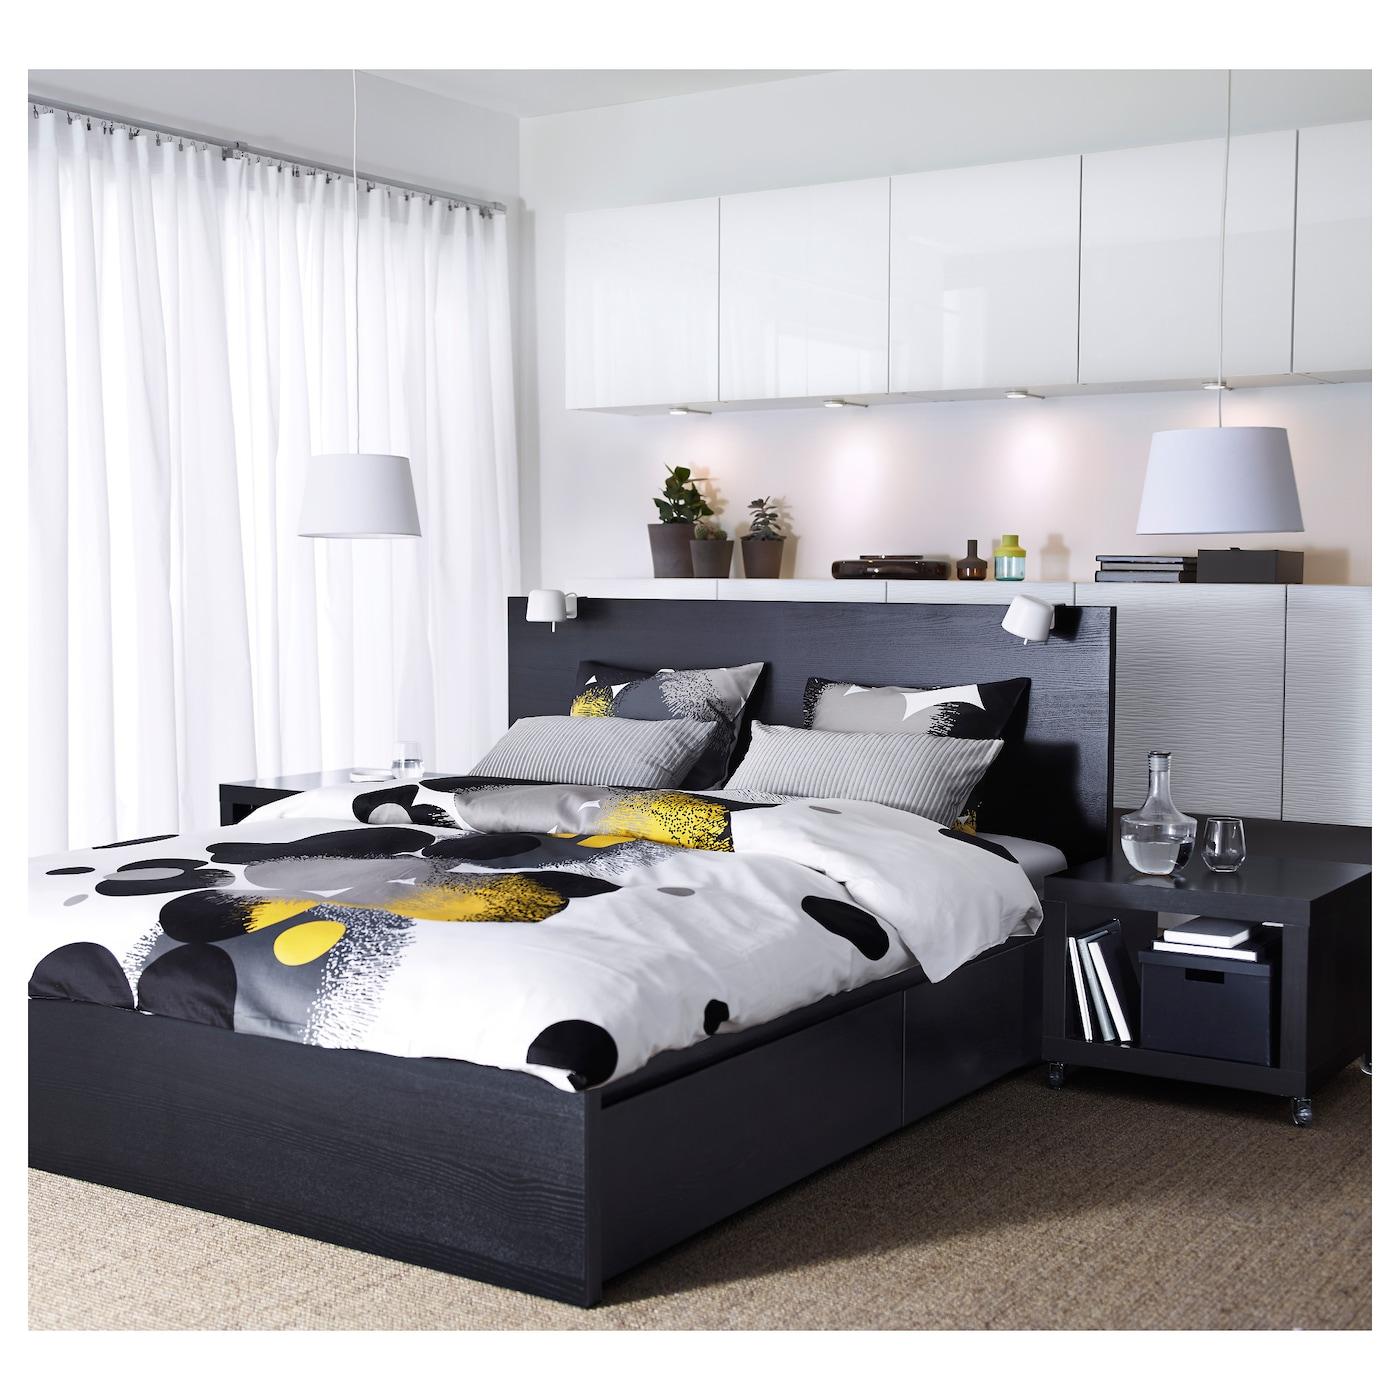 Ikea Malm Tweepersoonsbed Zwart.Bedframe Hoog Met 4 Bedlades Malm Zwartbruin Leirsund